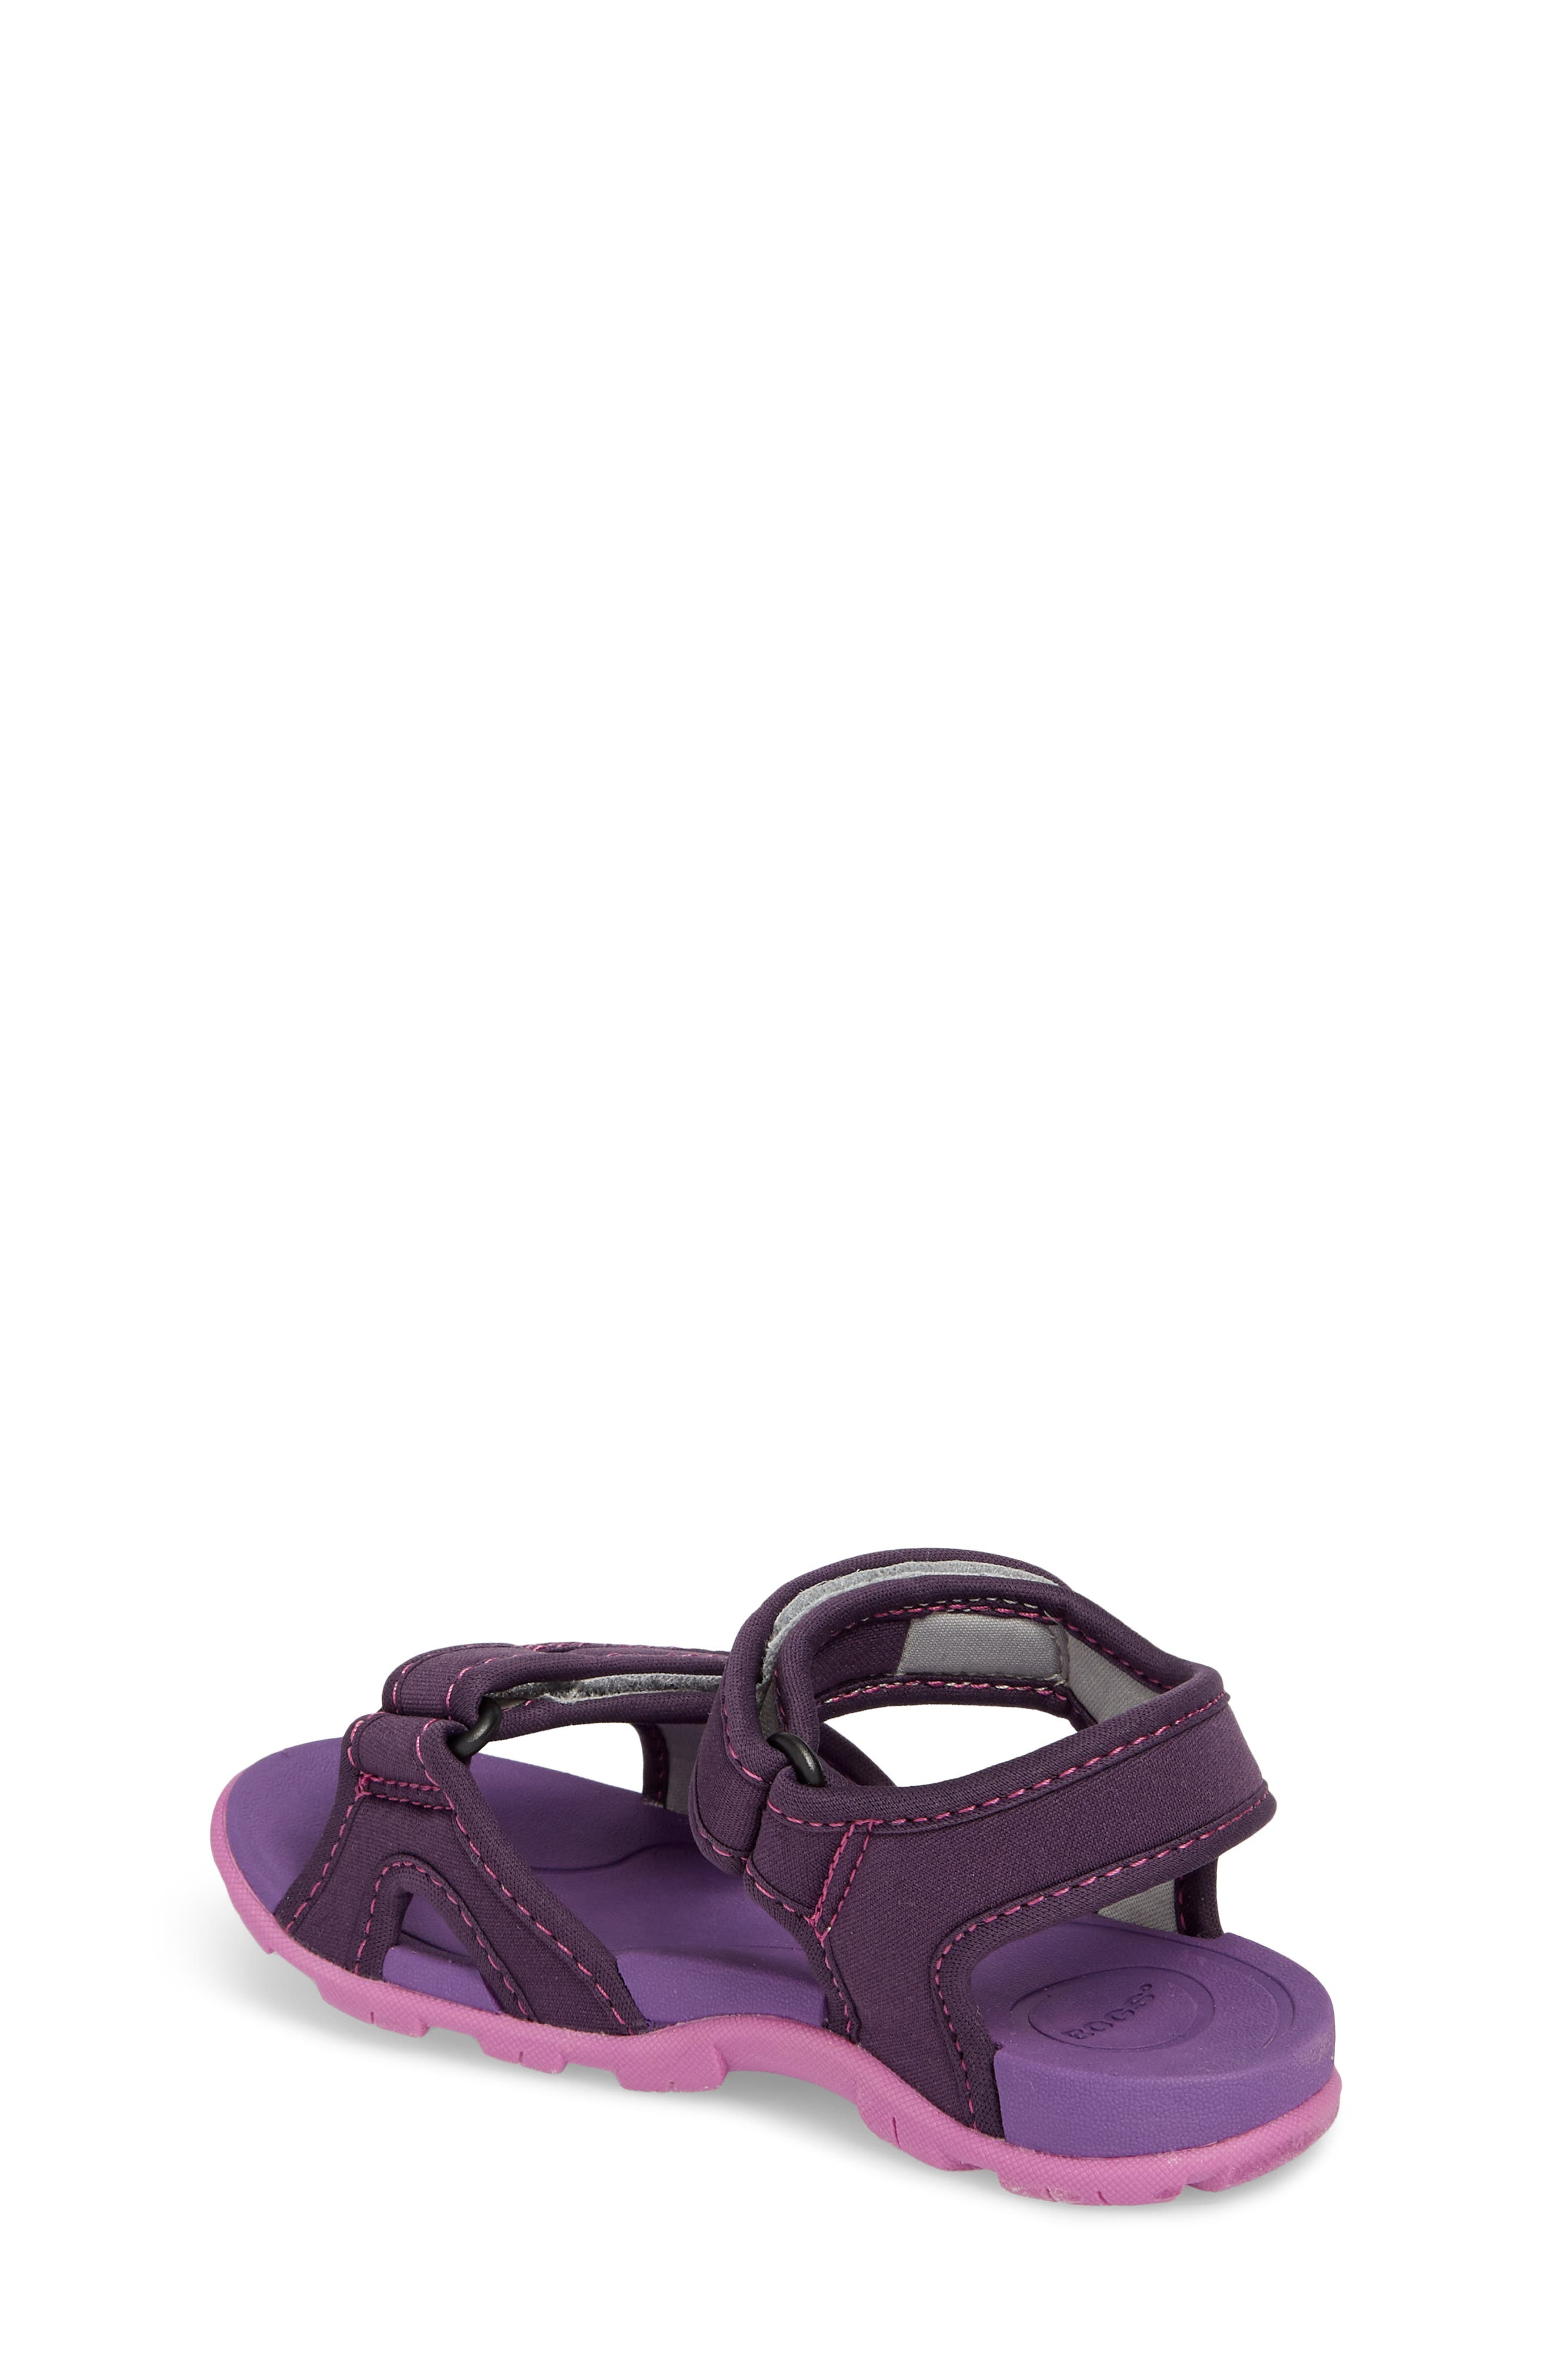 Whitefish Waterproof Sandal,                             Alternate thumbnail 2, color,                             Eggplant Multi